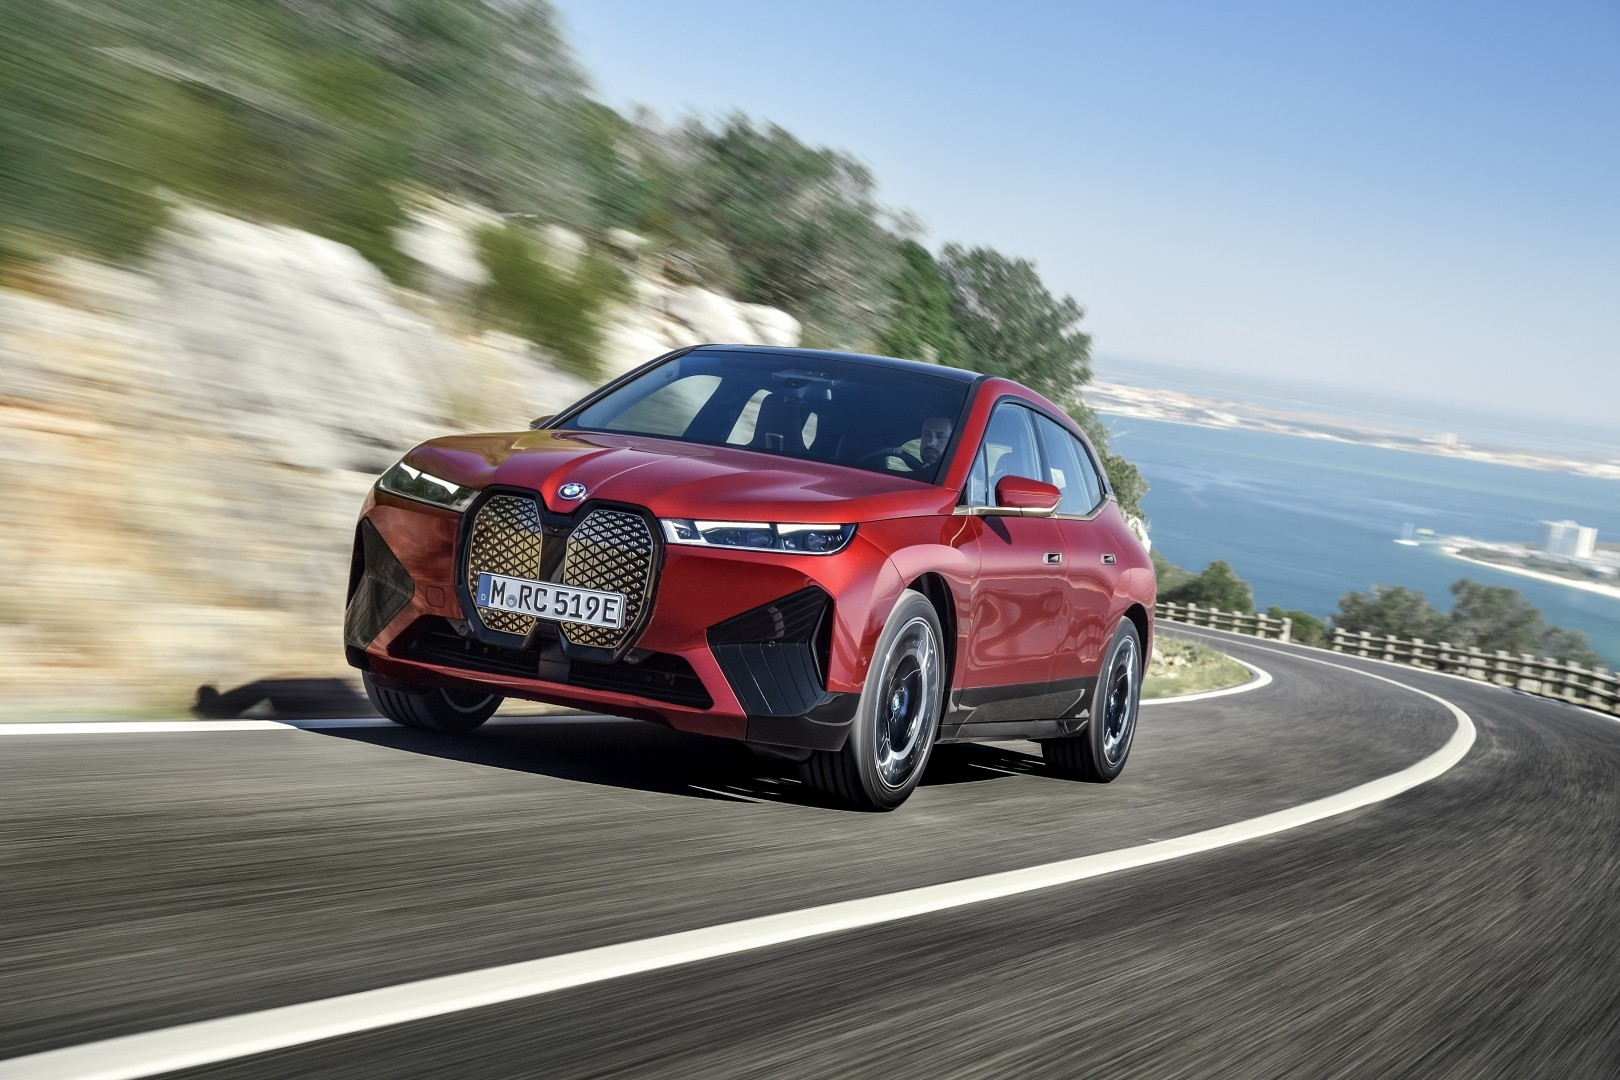 bmw ix specs & photos - 2021 - autoevolution